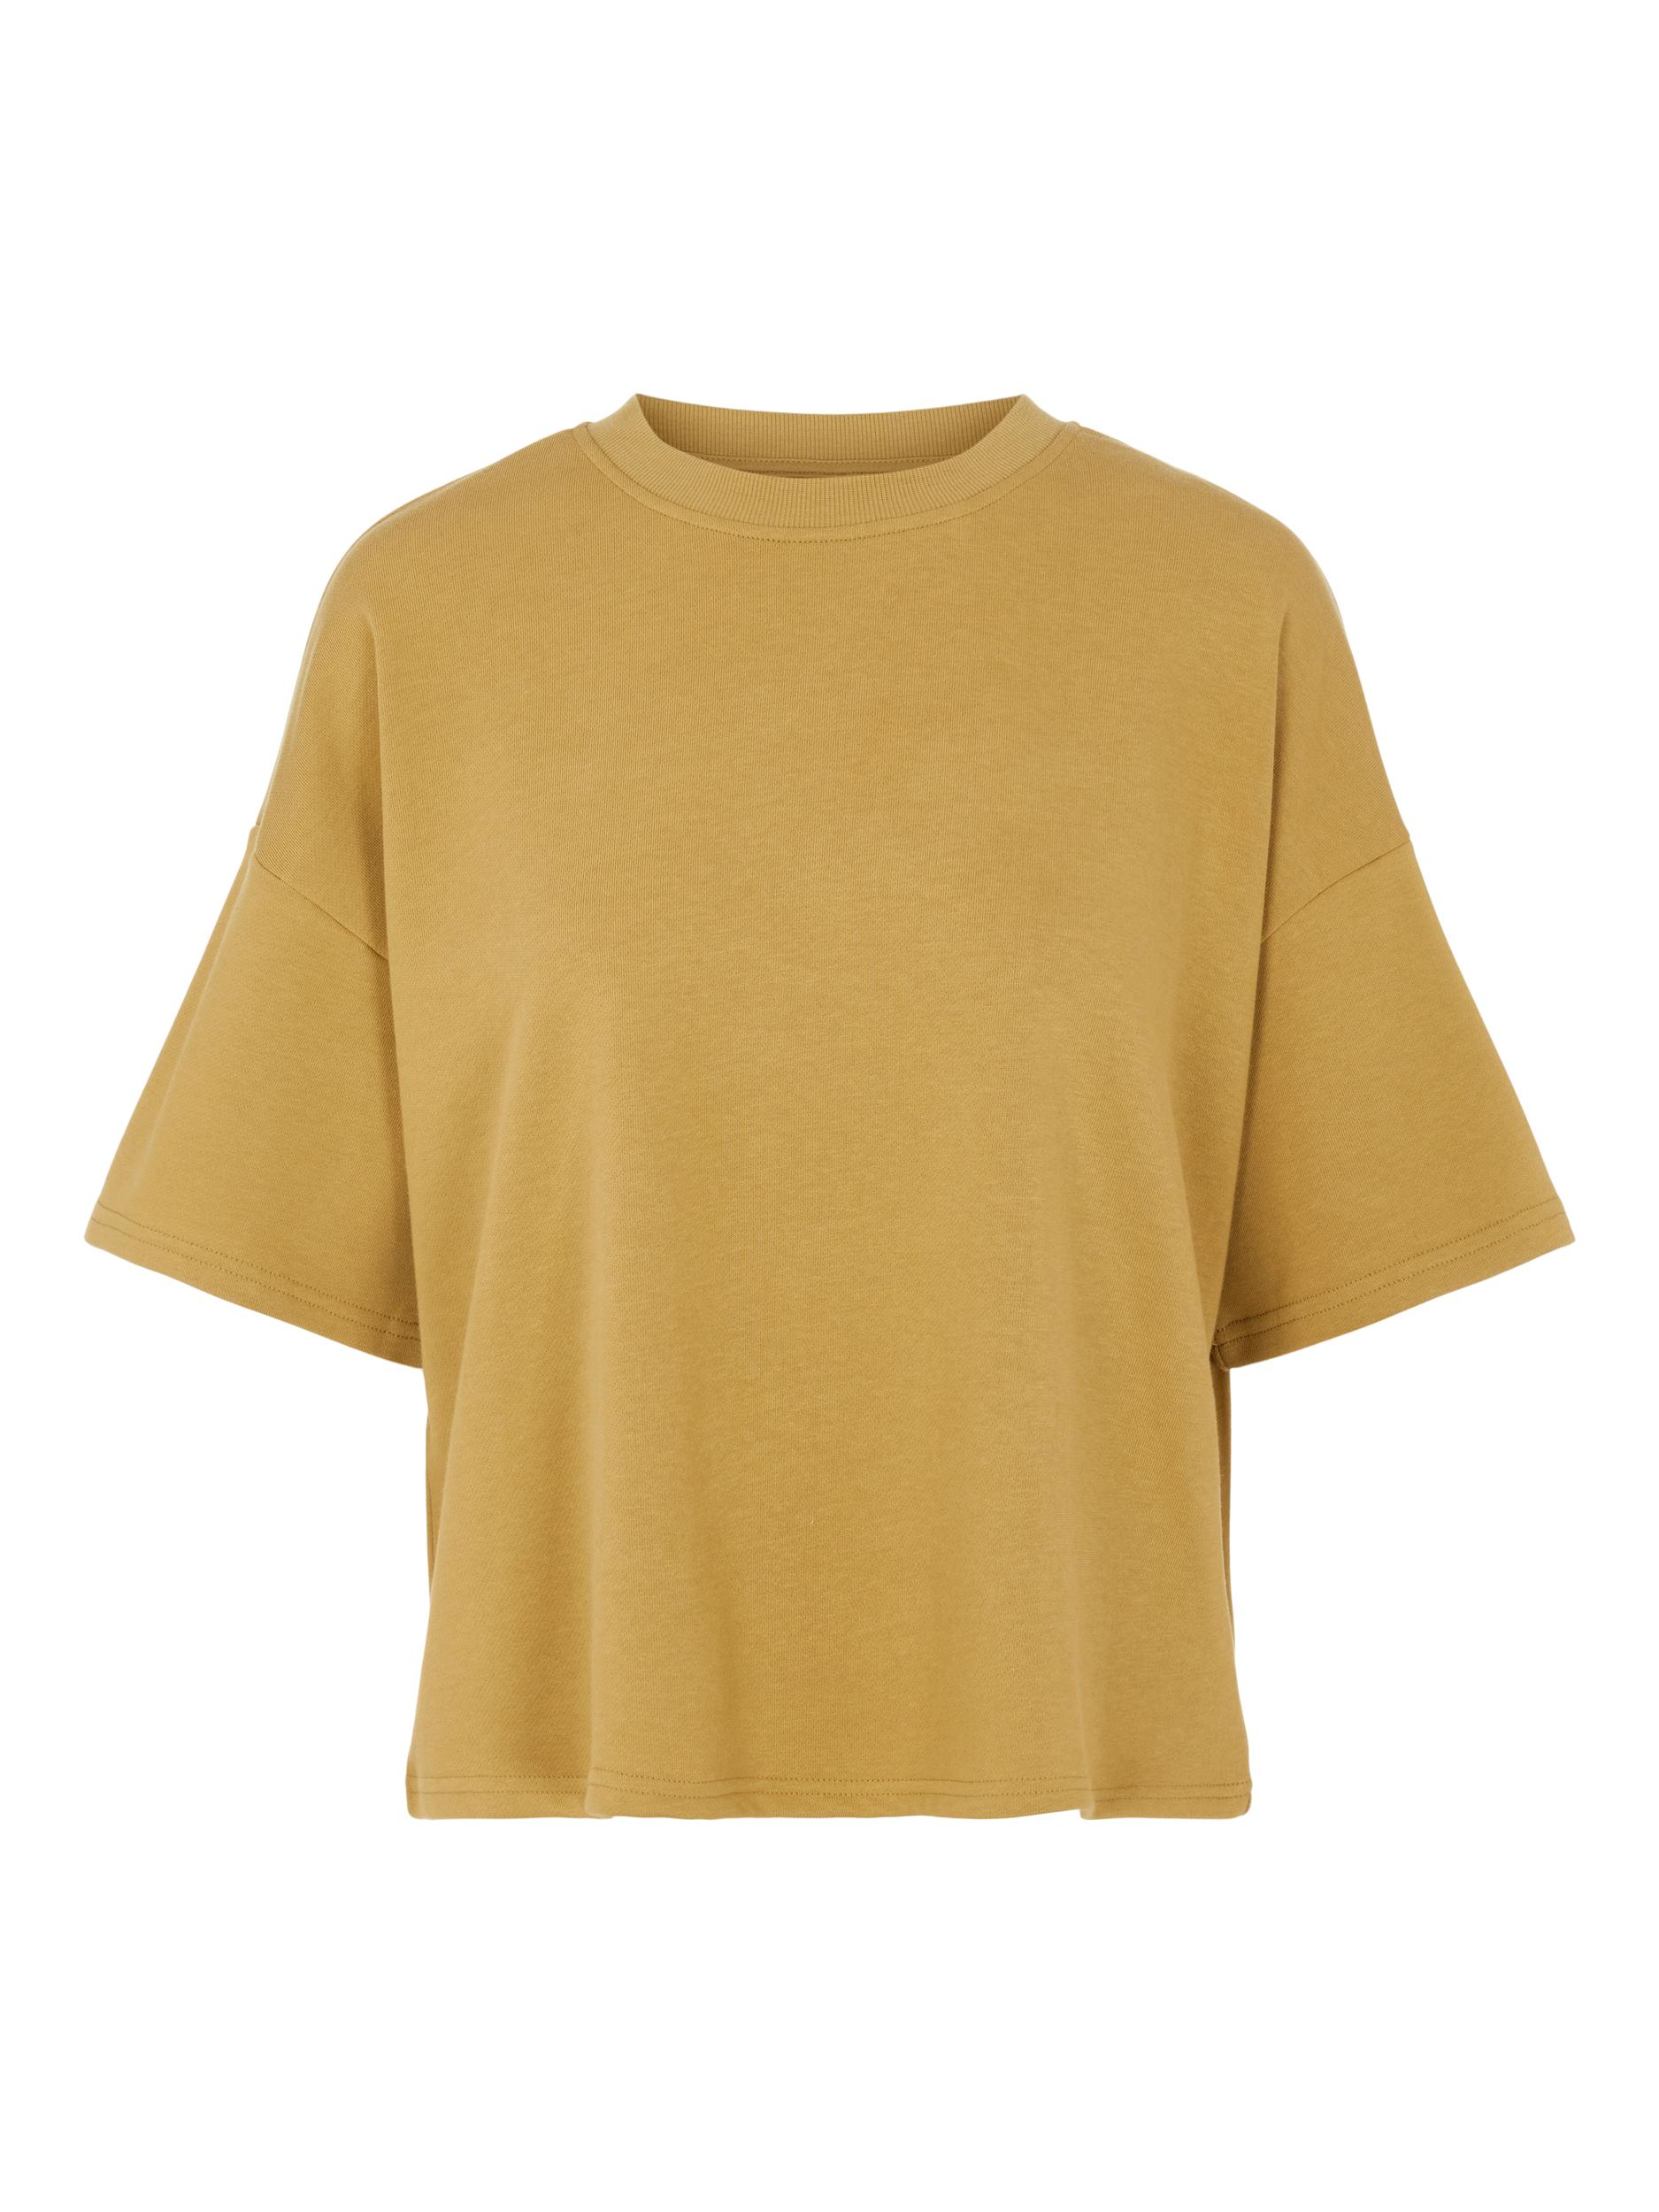 Pieces Chilli Summer t-shirt, khaki, x-large